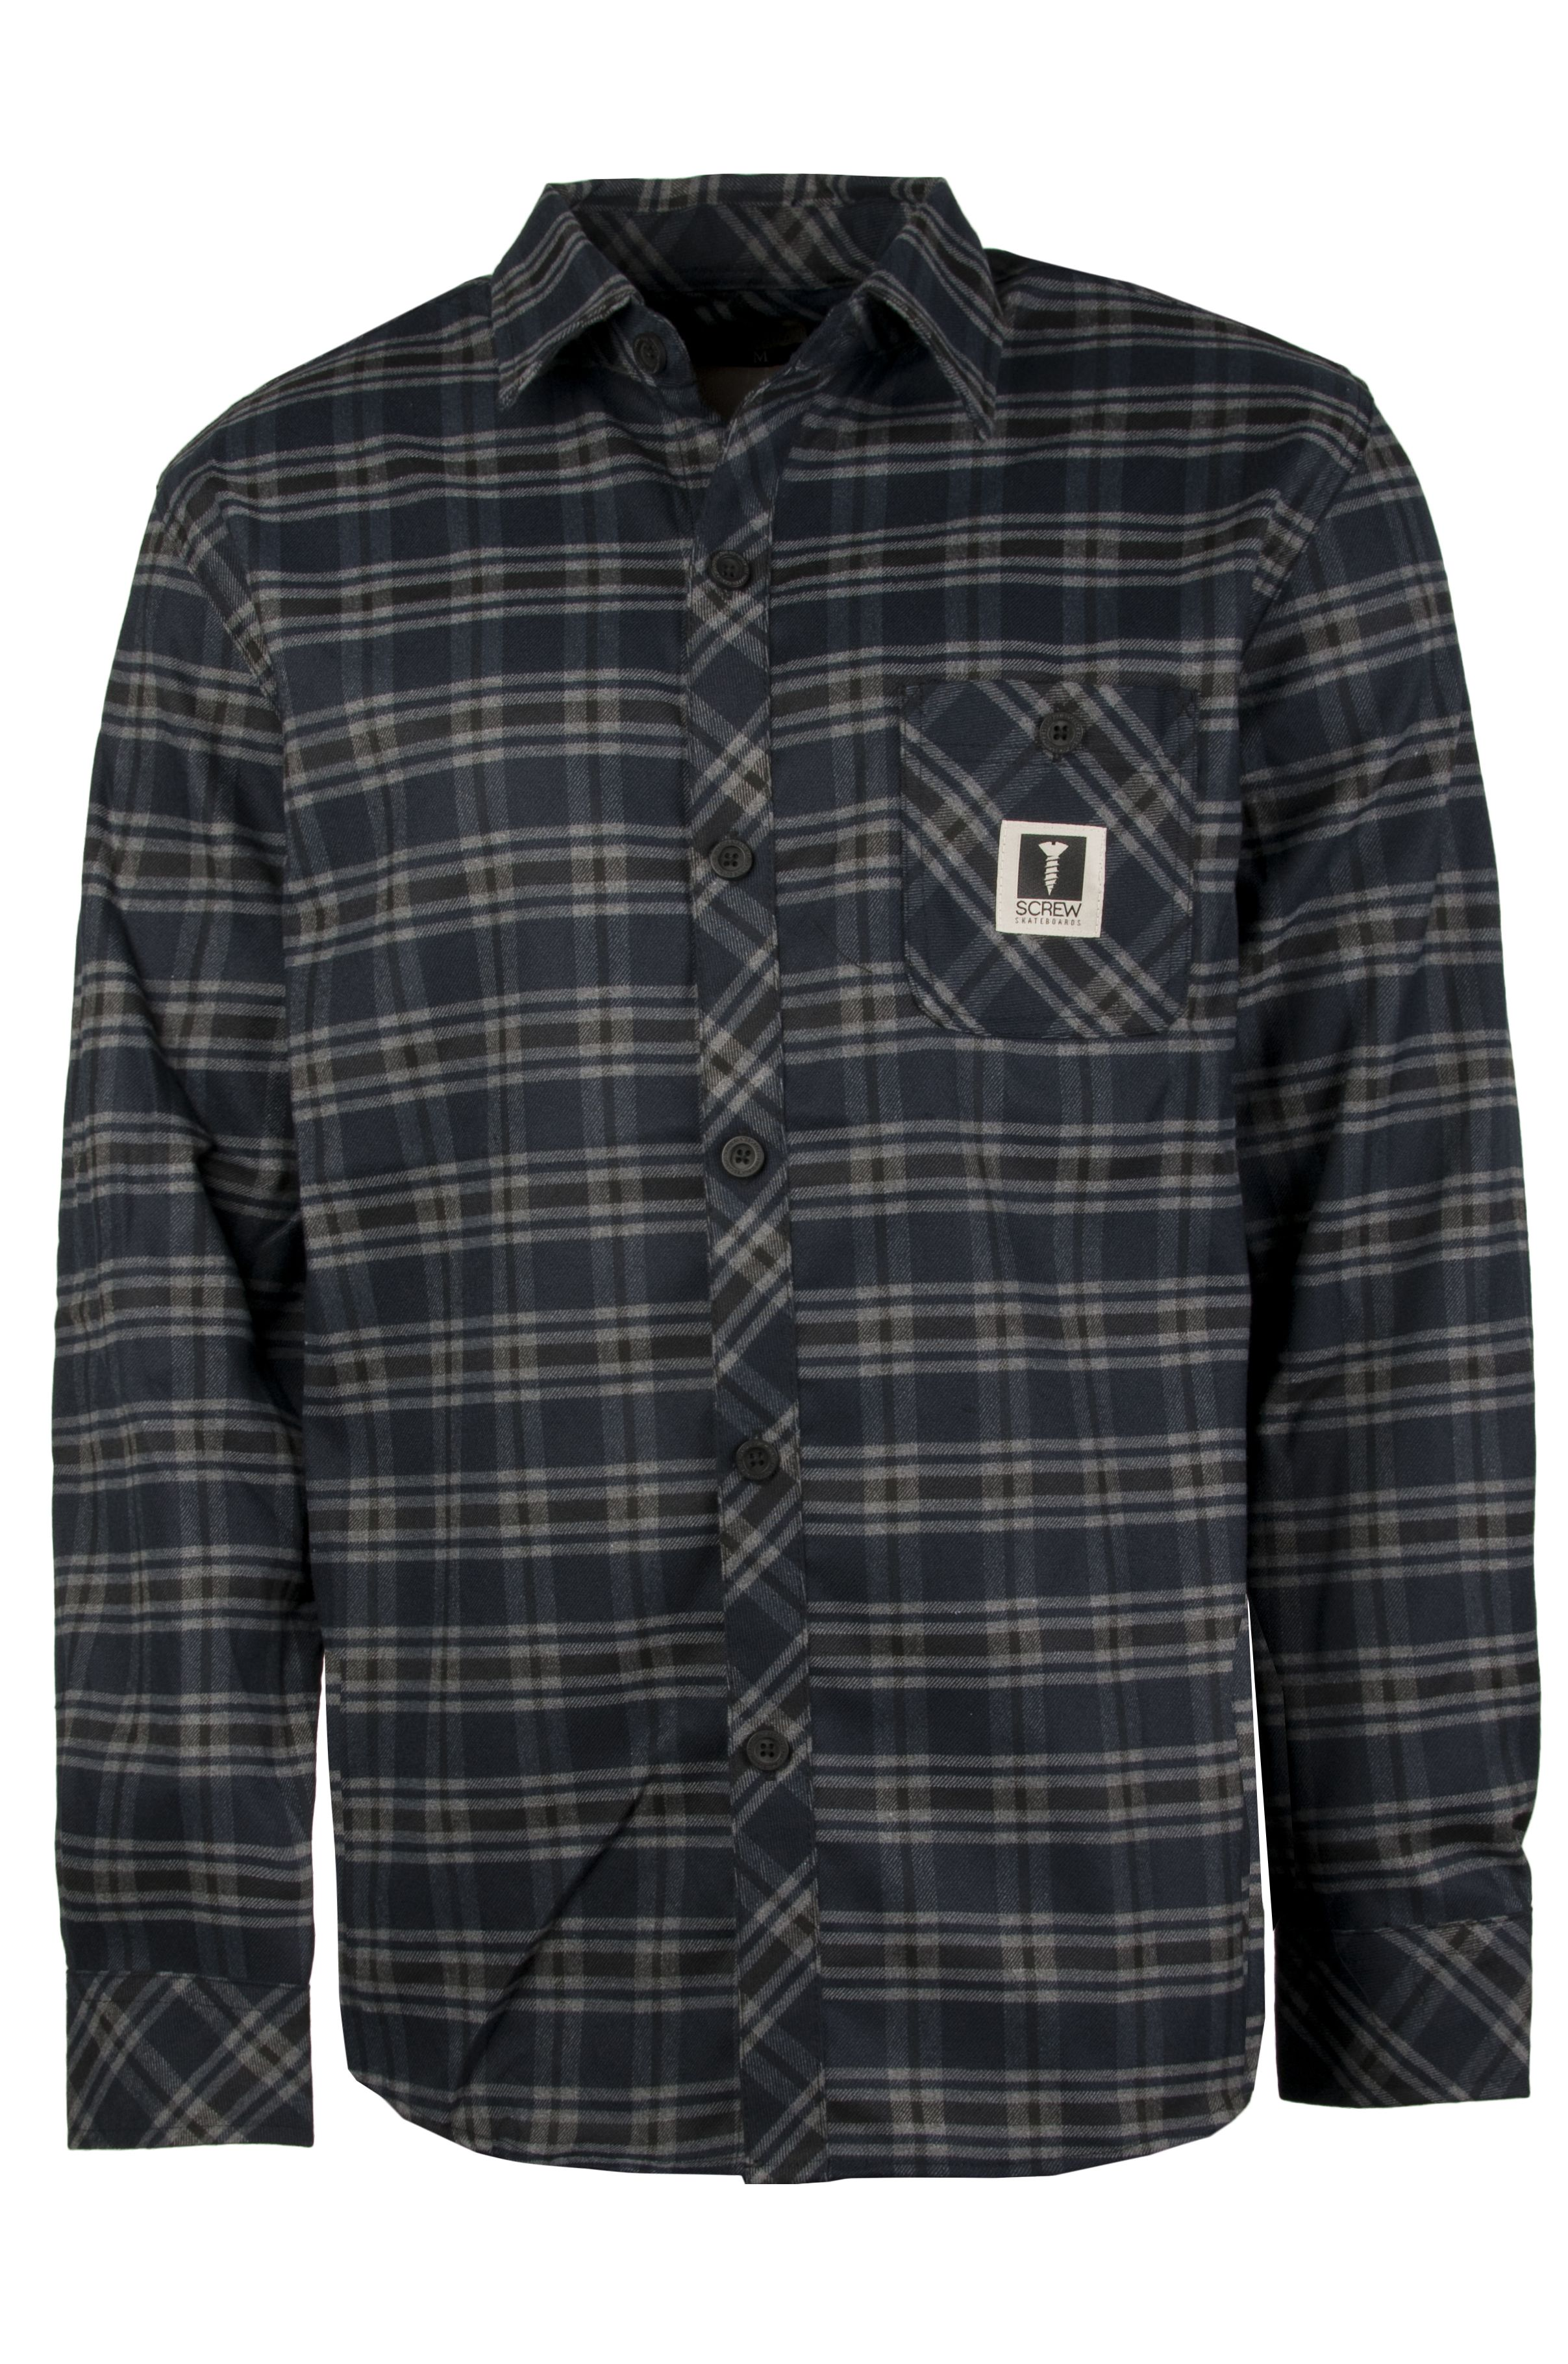 Screw Shirt CURBS?21 Navy